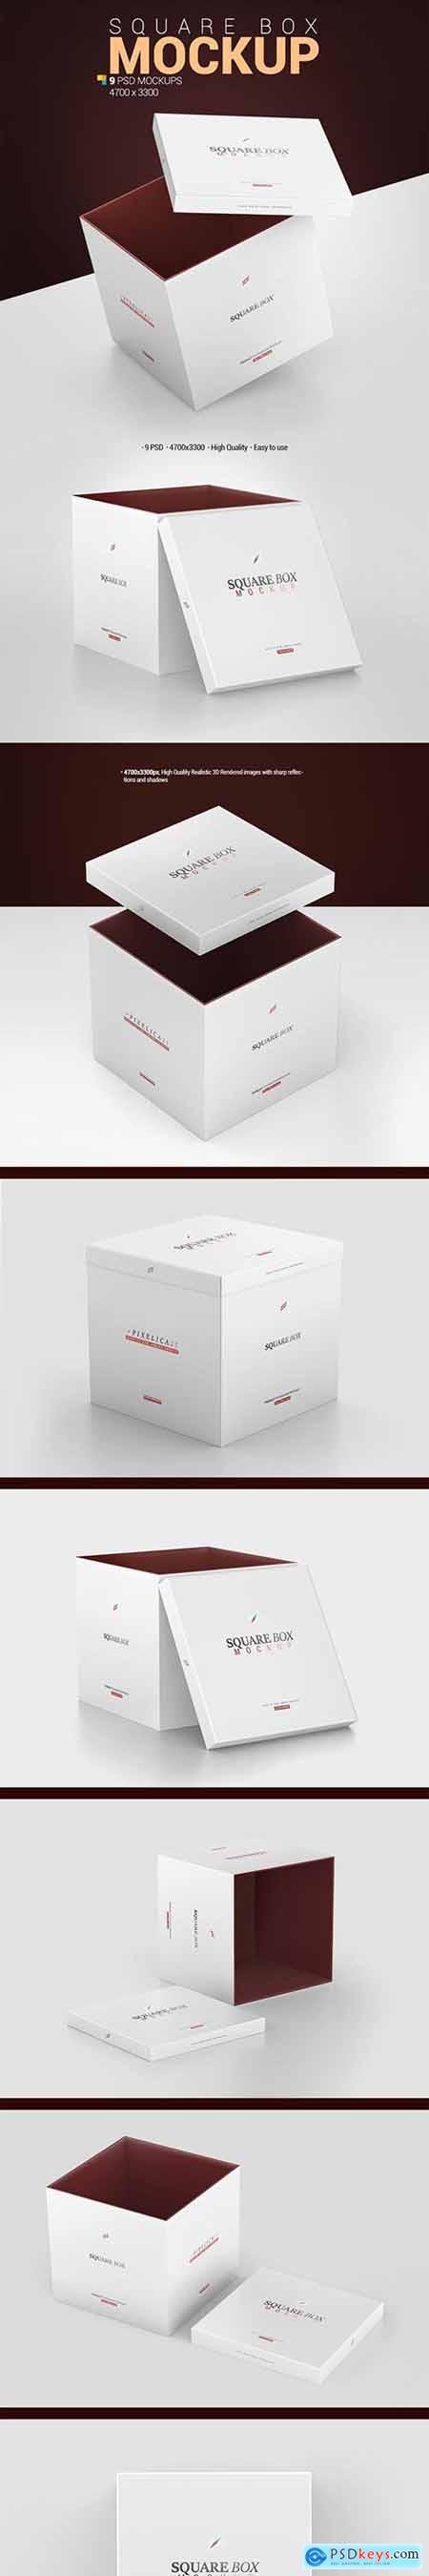 Square Box Mockup 29344142